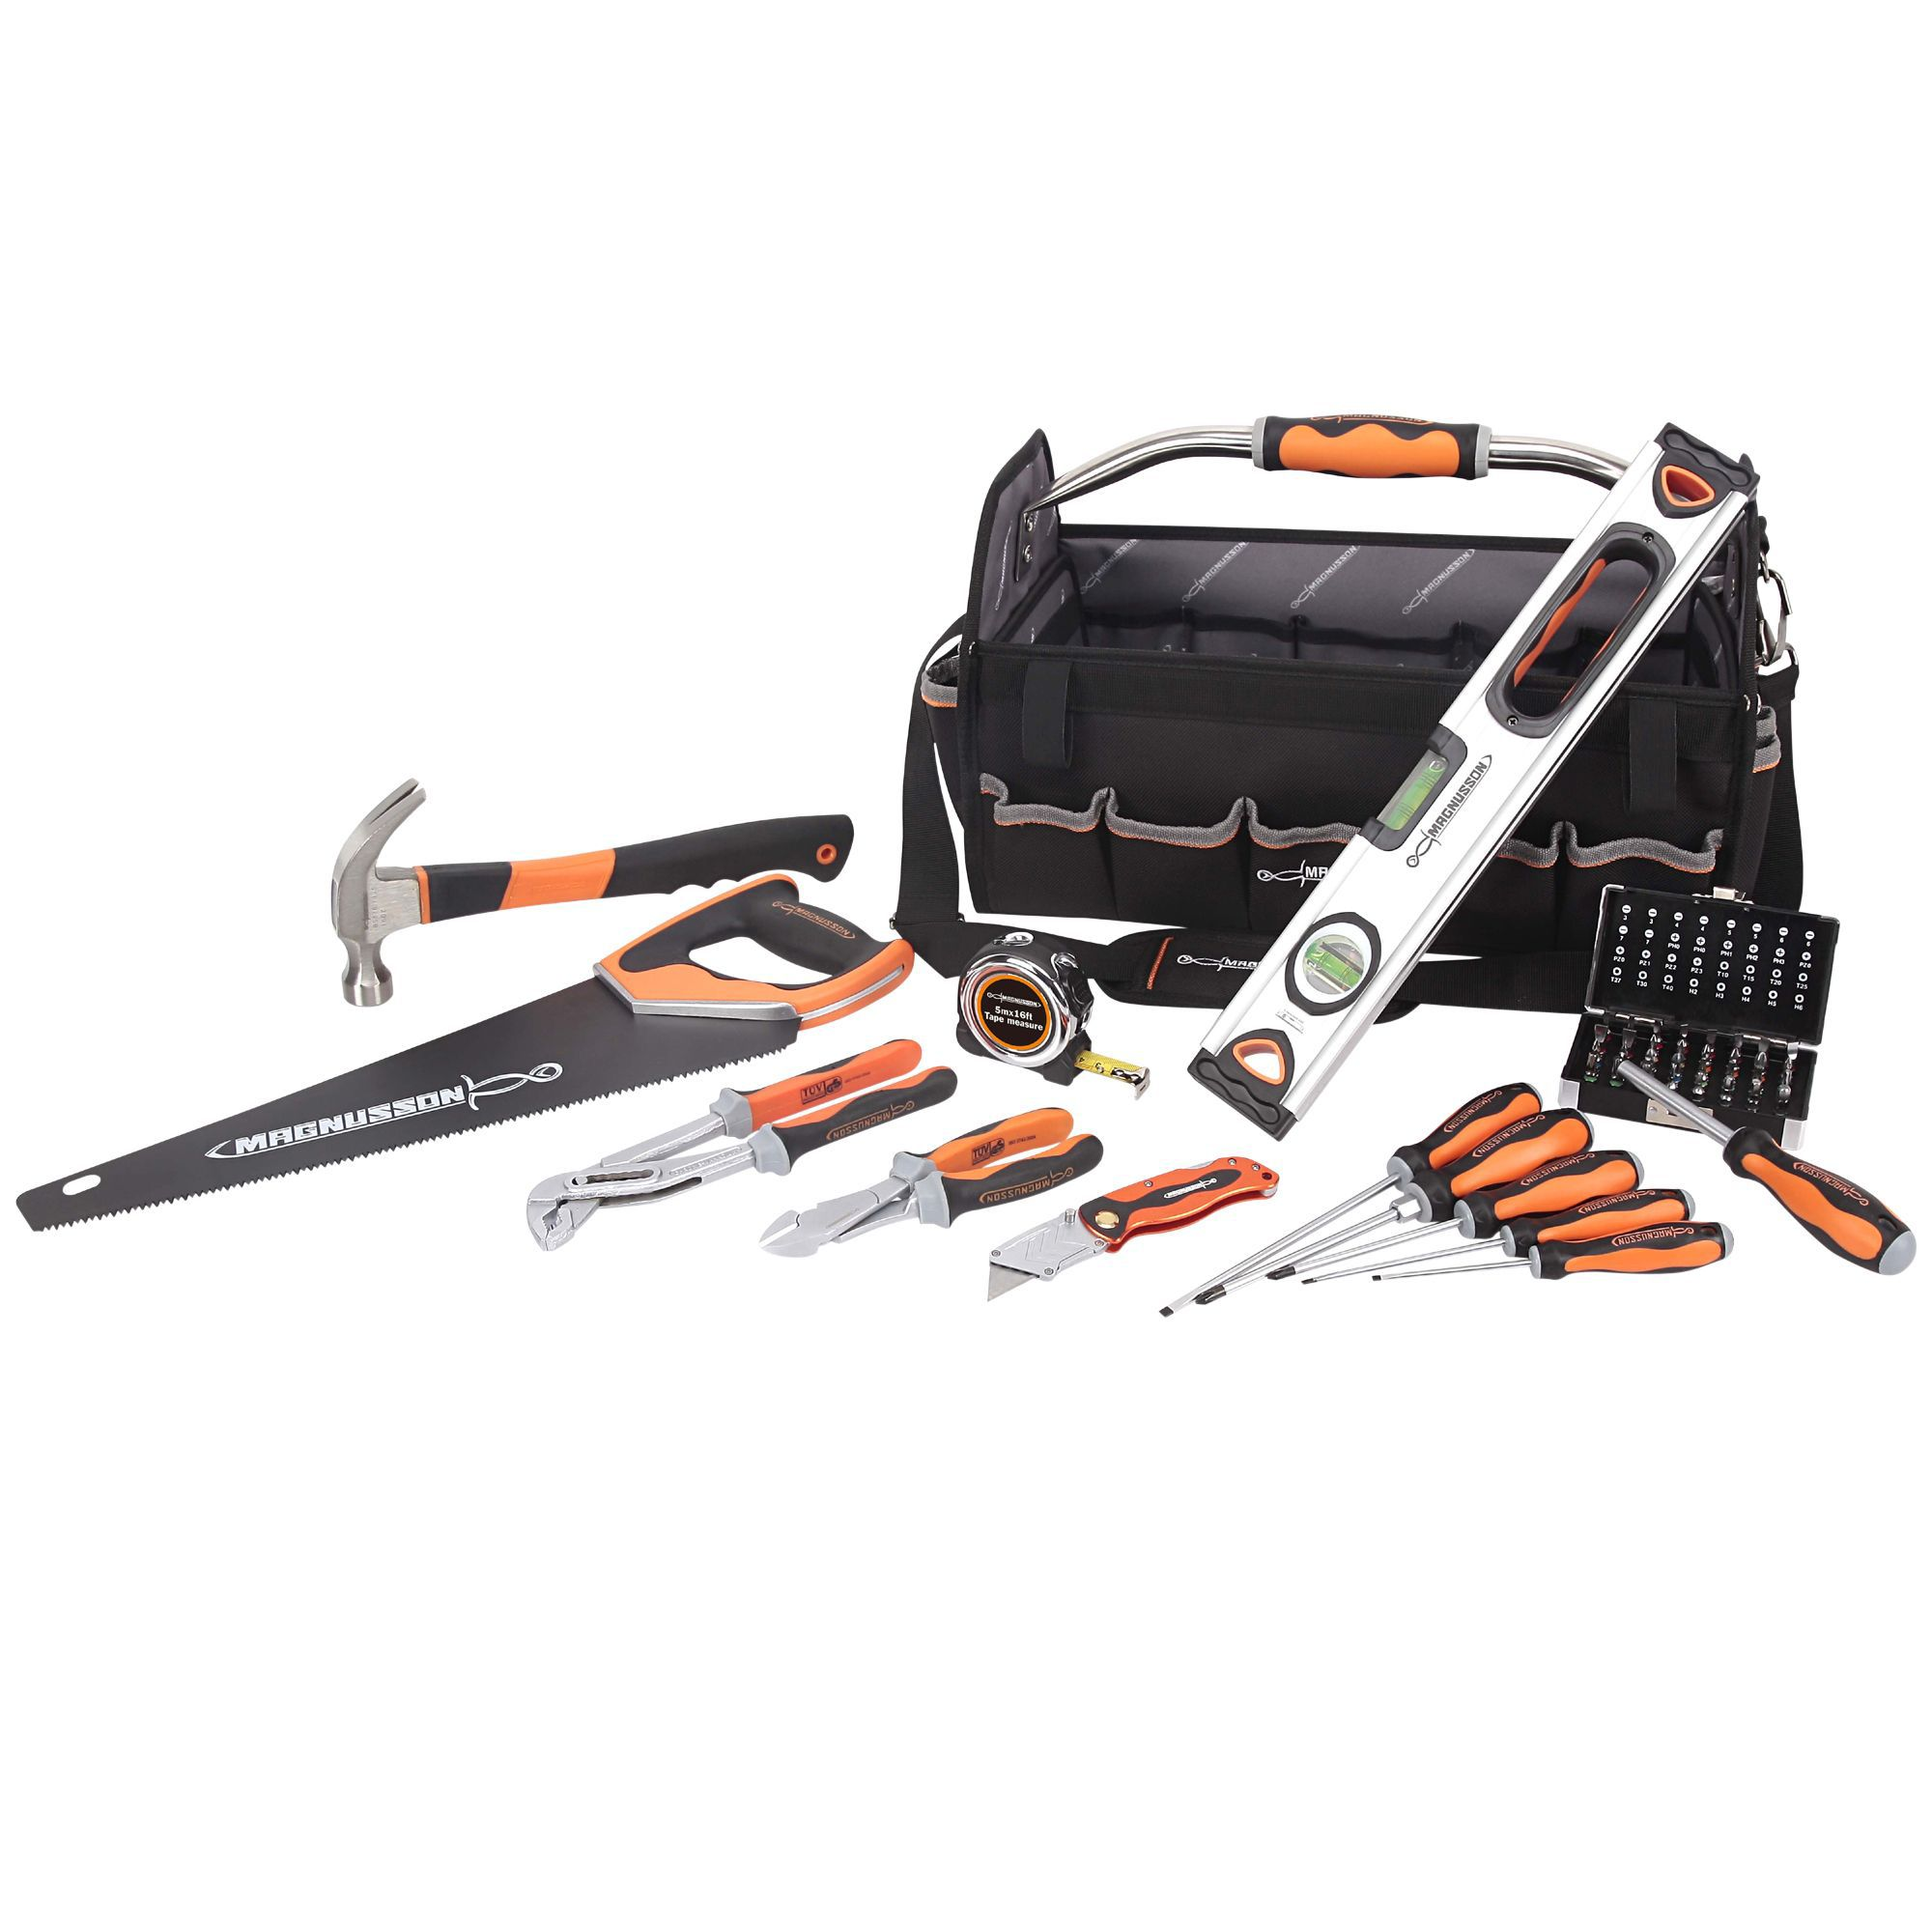 Magnusson 1 Piece Tool Kit Clearance Diy At B Amp Q